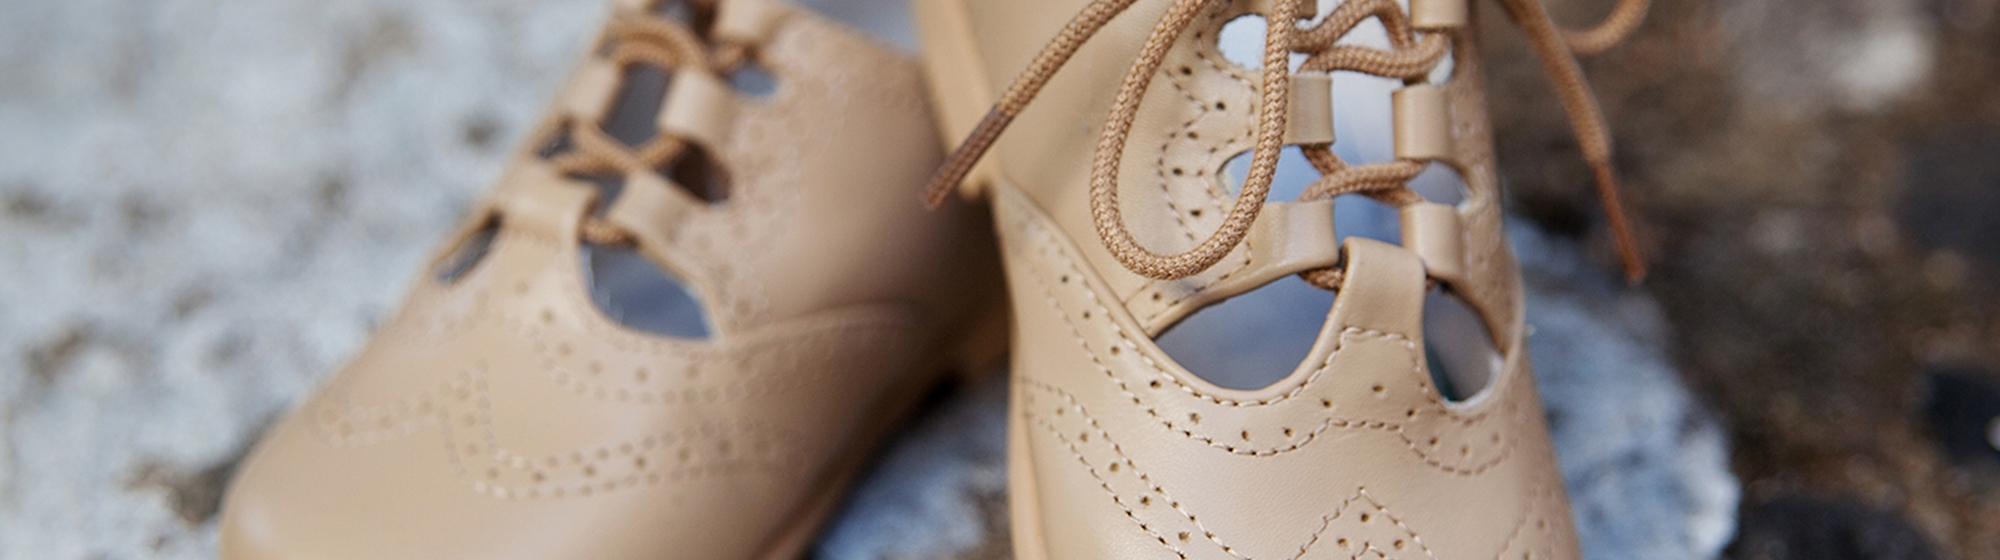 55b44f07db9 Chaussures anglaises pour garçon